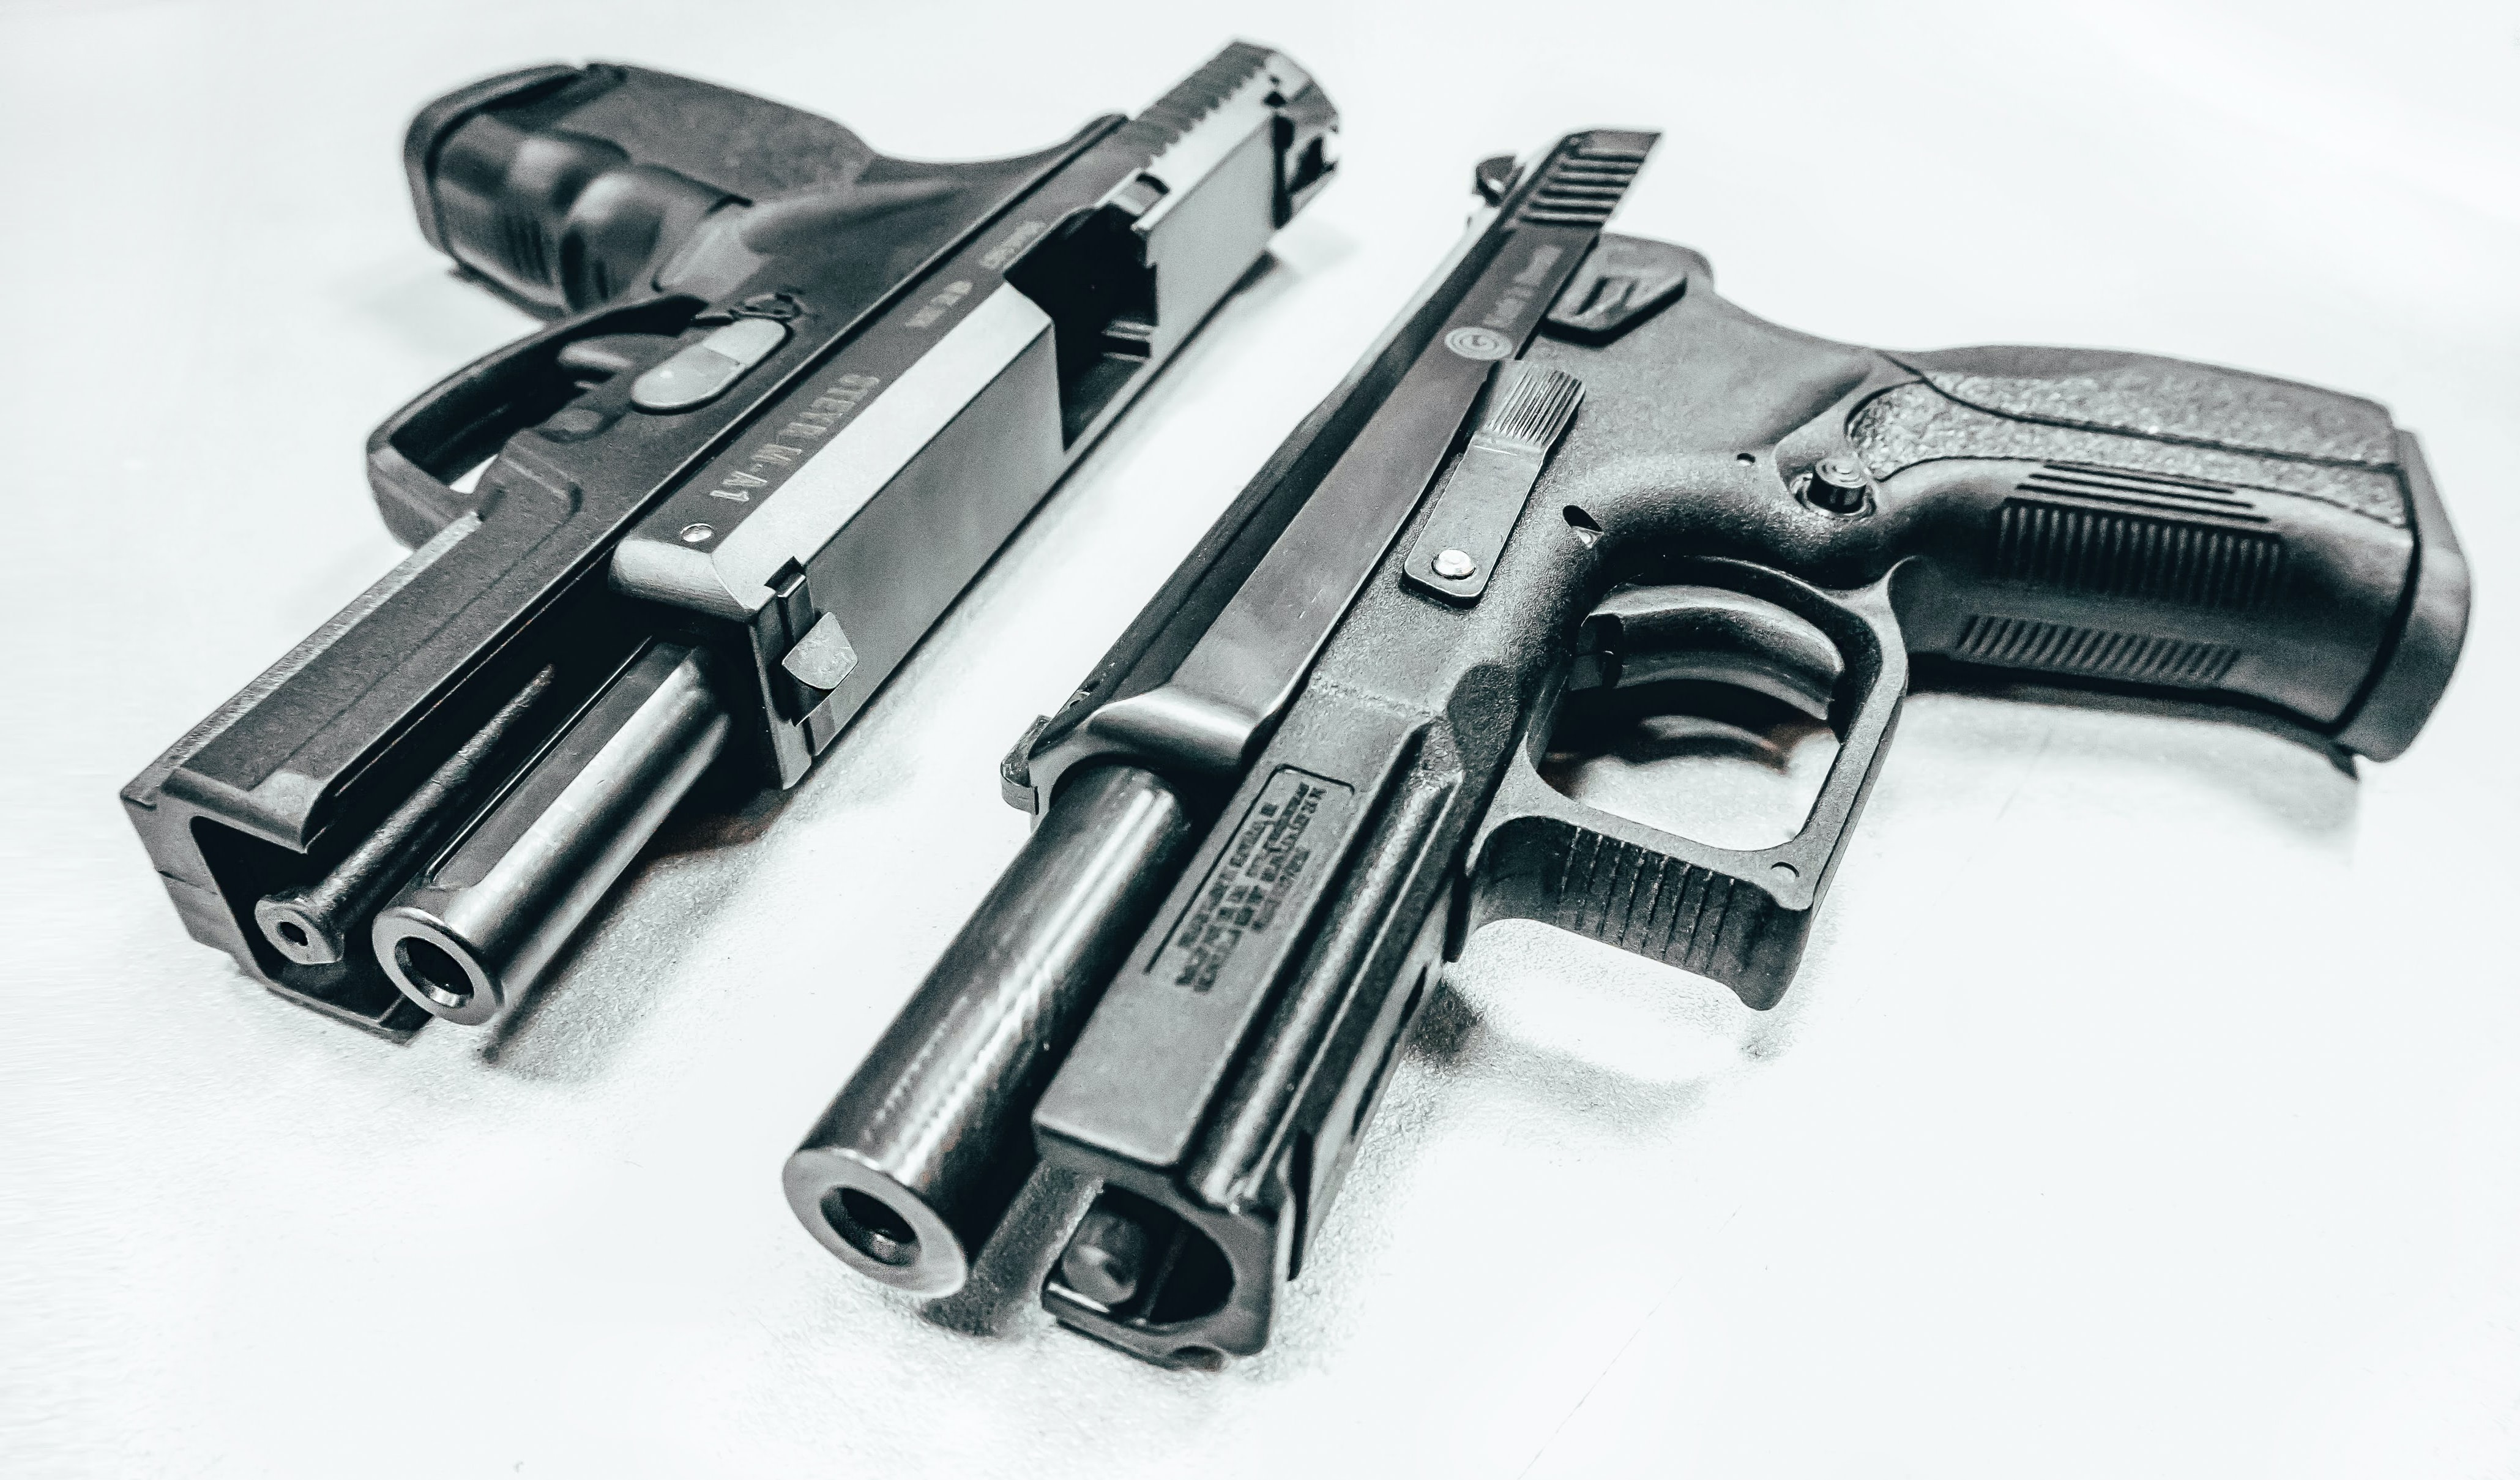 nowacceptingfirearms